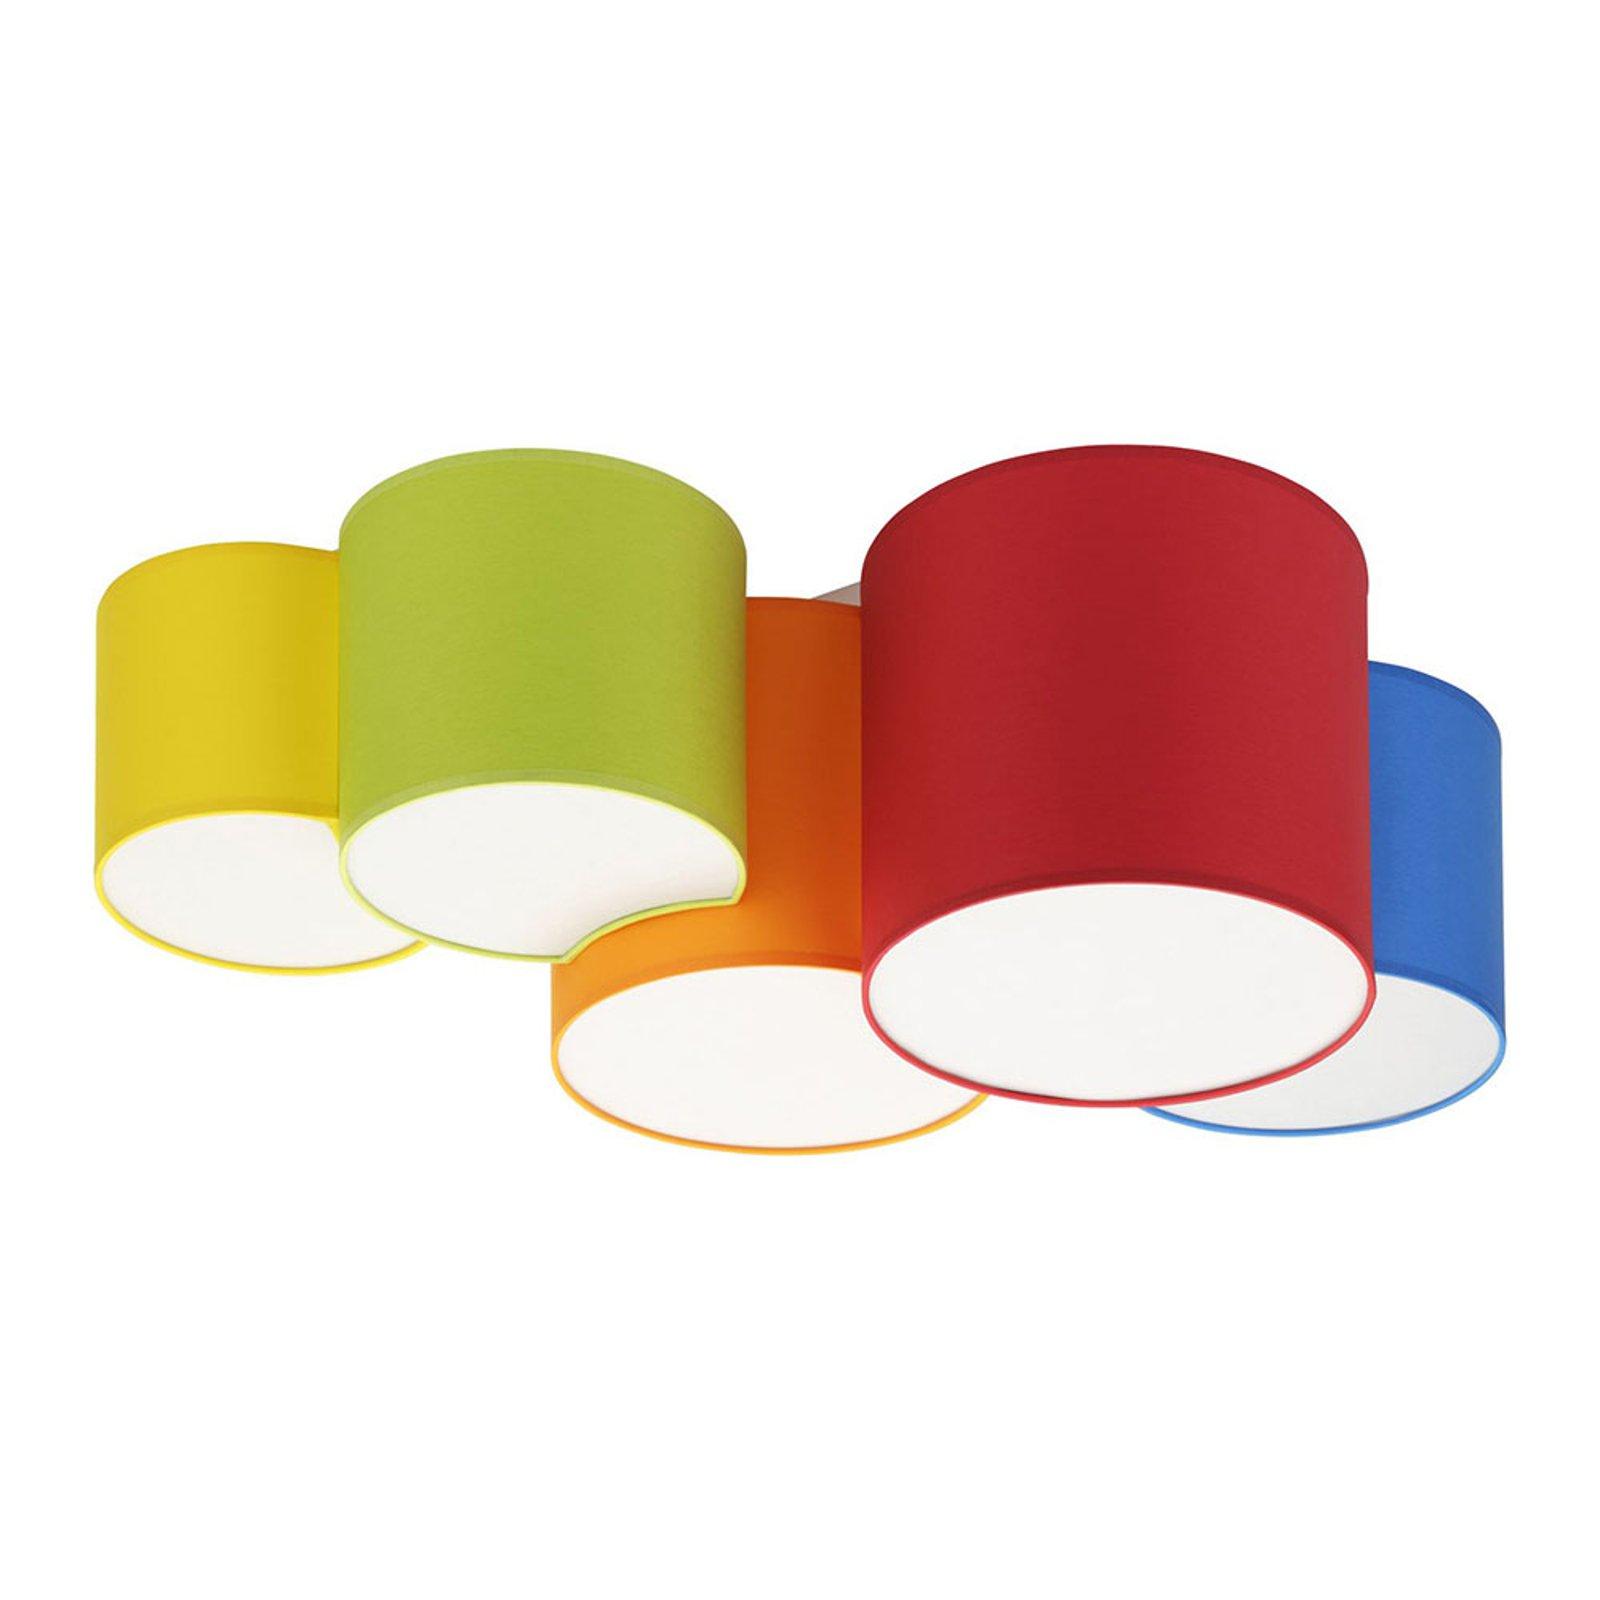 Taklampe Mona, fem lyskilder, flerfarget